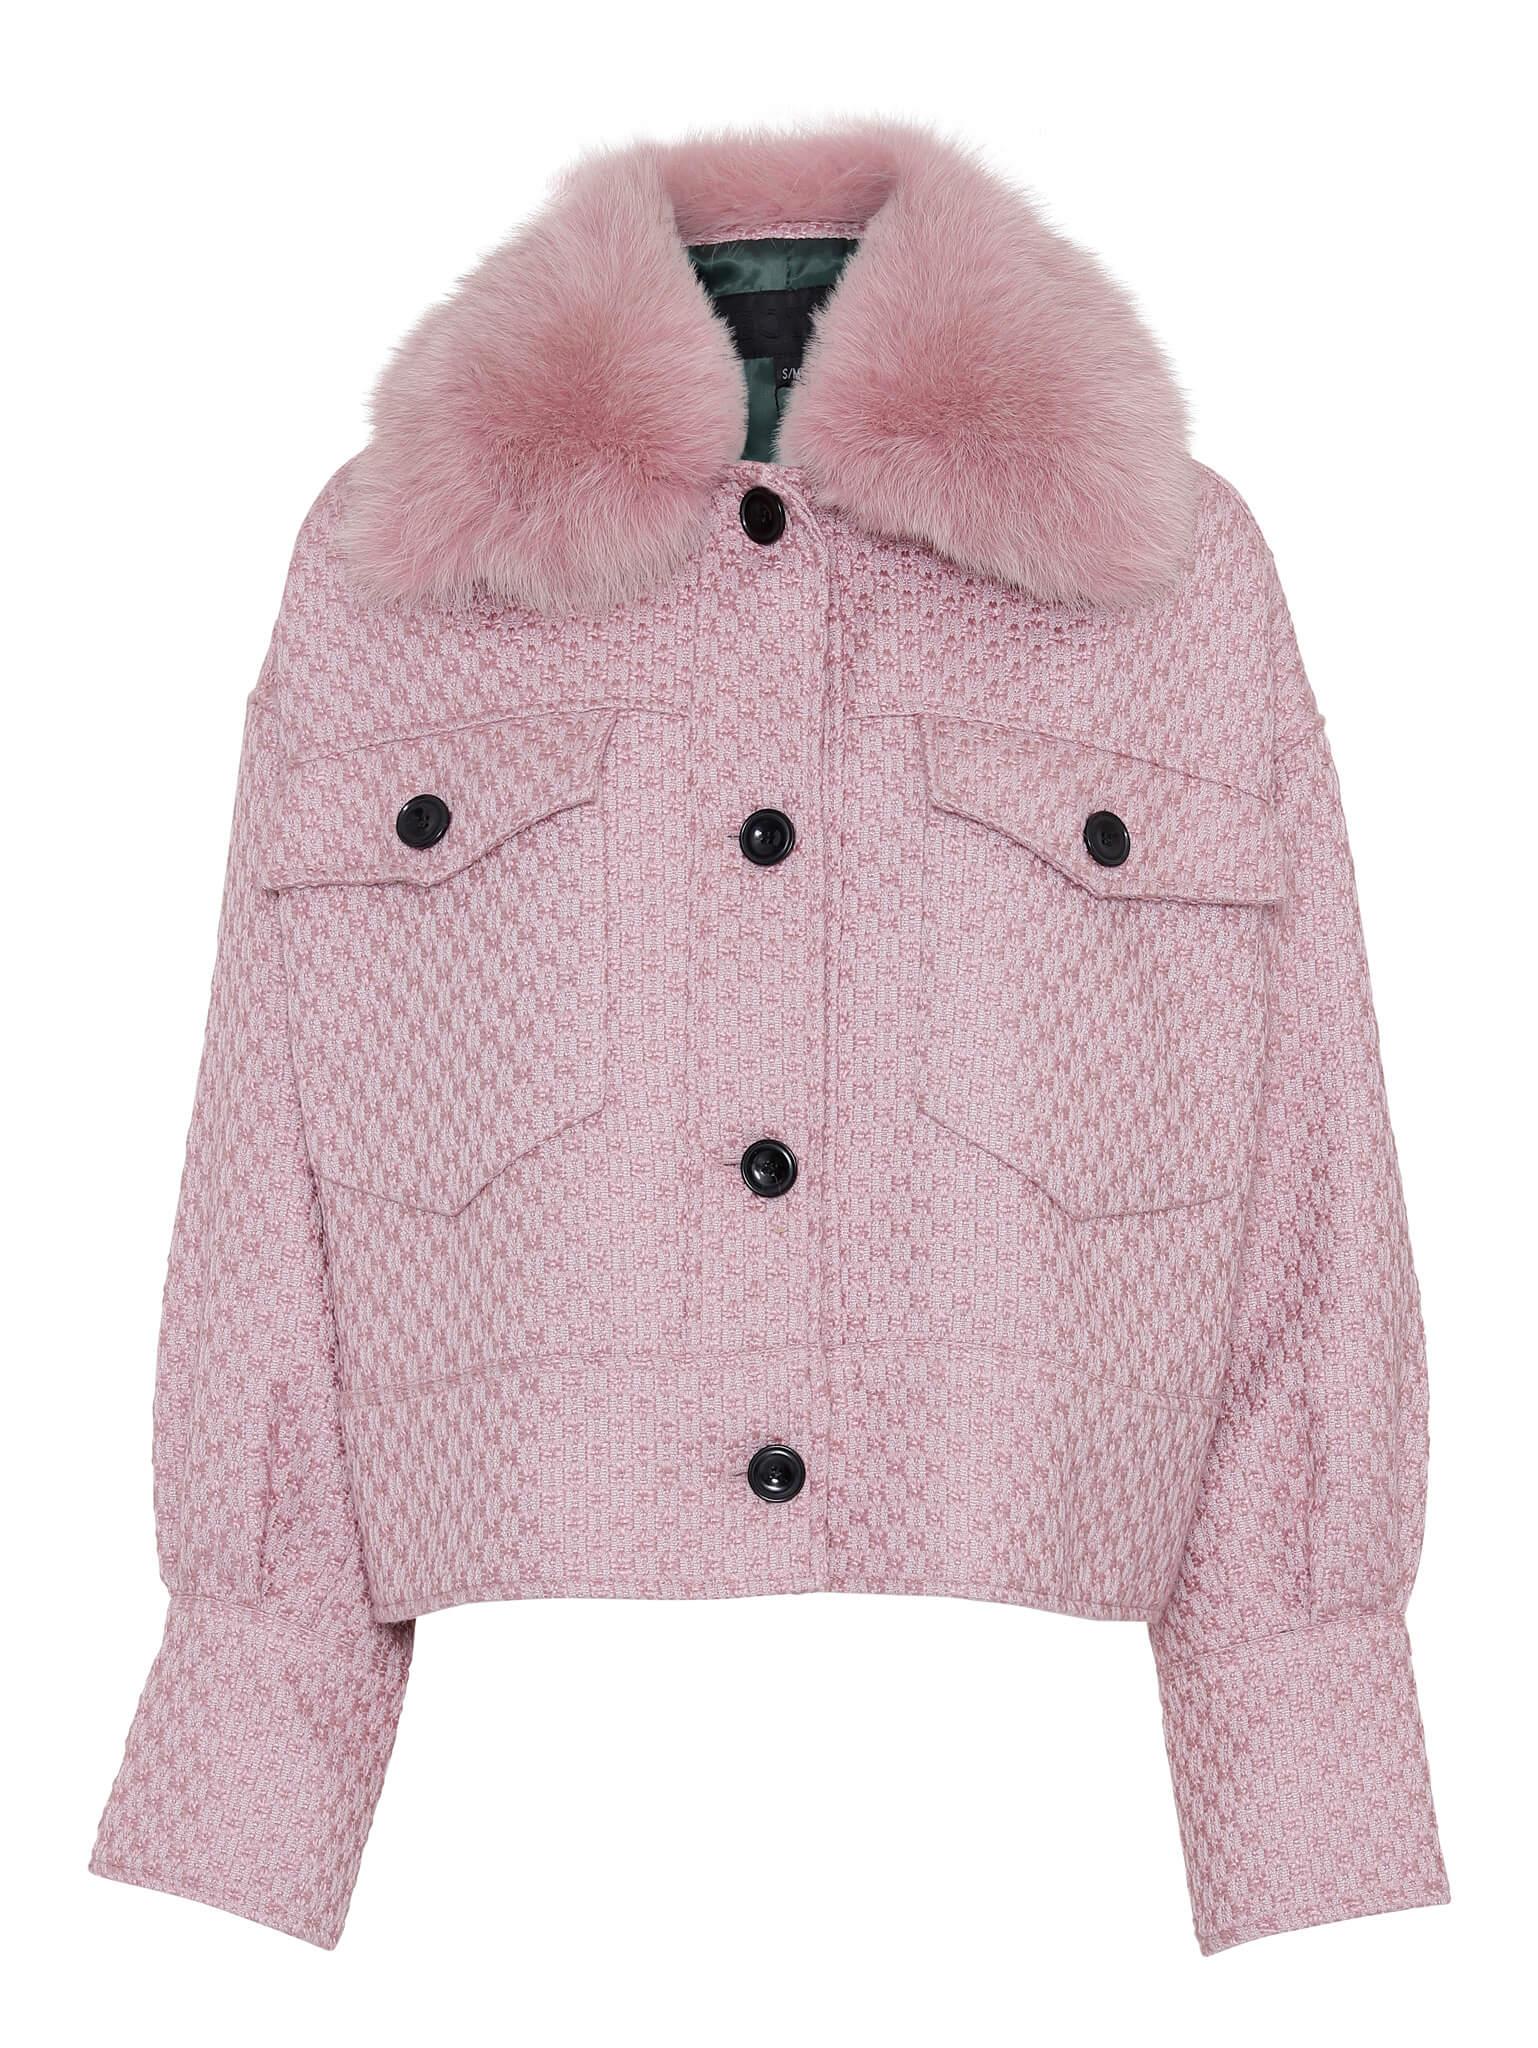 Lyserød, jakke, overgangsjakke, Meotine jakke. (Foto: Meotine)